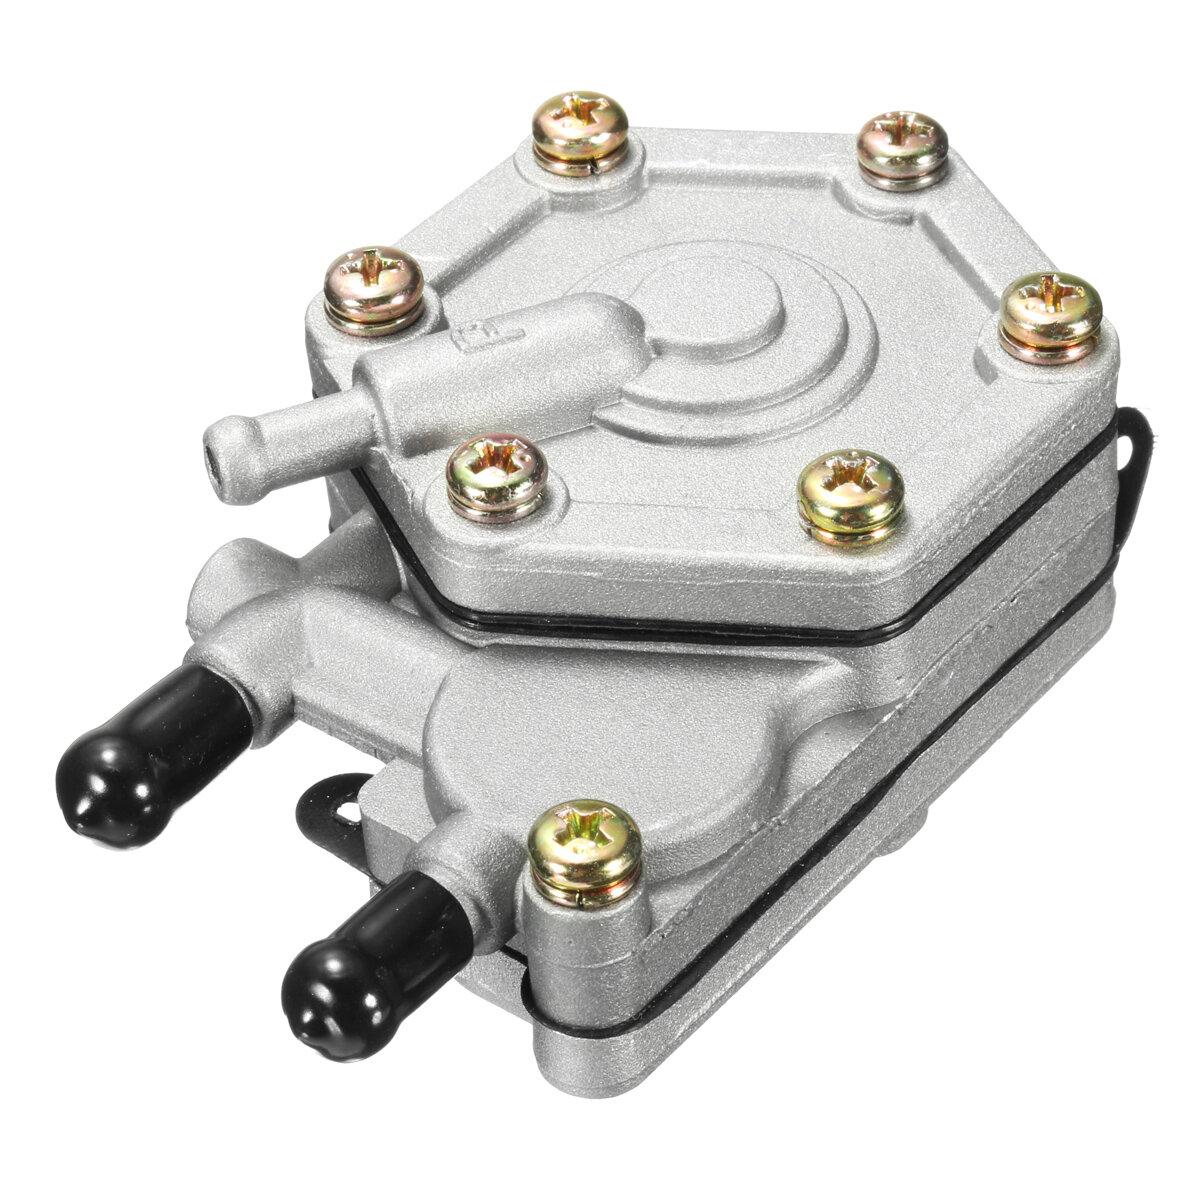 hight resolution of fuel pump for polaris sportsman 350 400 500 600 700 mv7 6x6 magnum outlaw atv cod